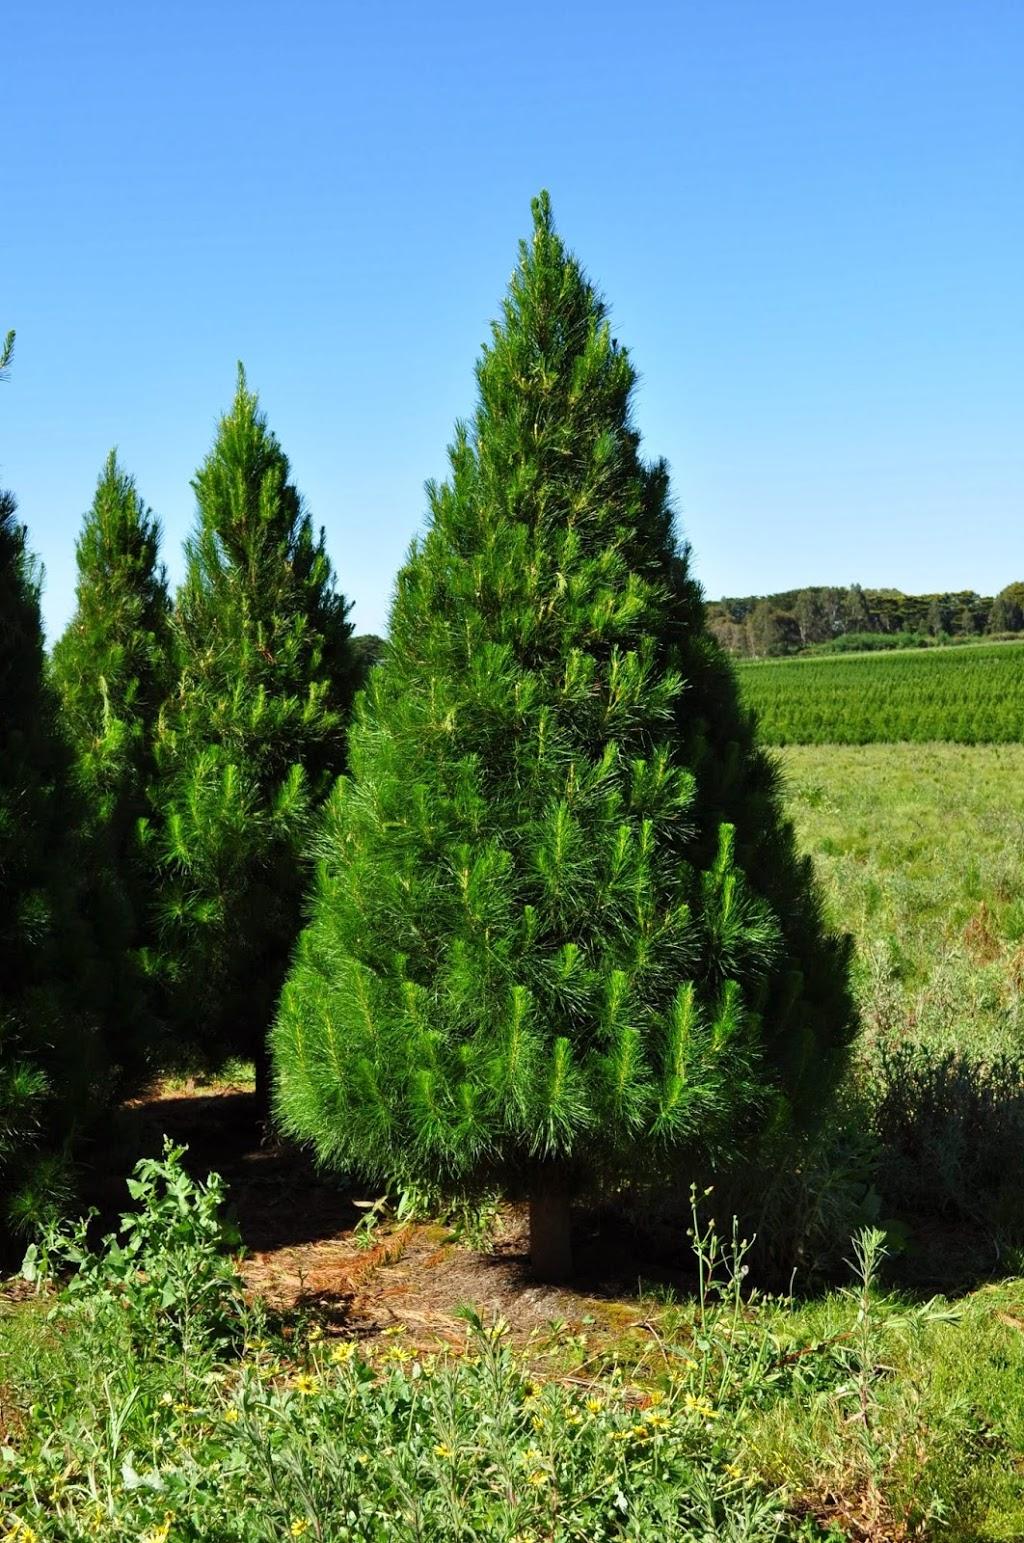 Colac Christmas Tree Farm | point of interest | 5855 Princes Hwy, Irrewarra VIC 3249, Australia | 0499900885 OR +61 499 900 885